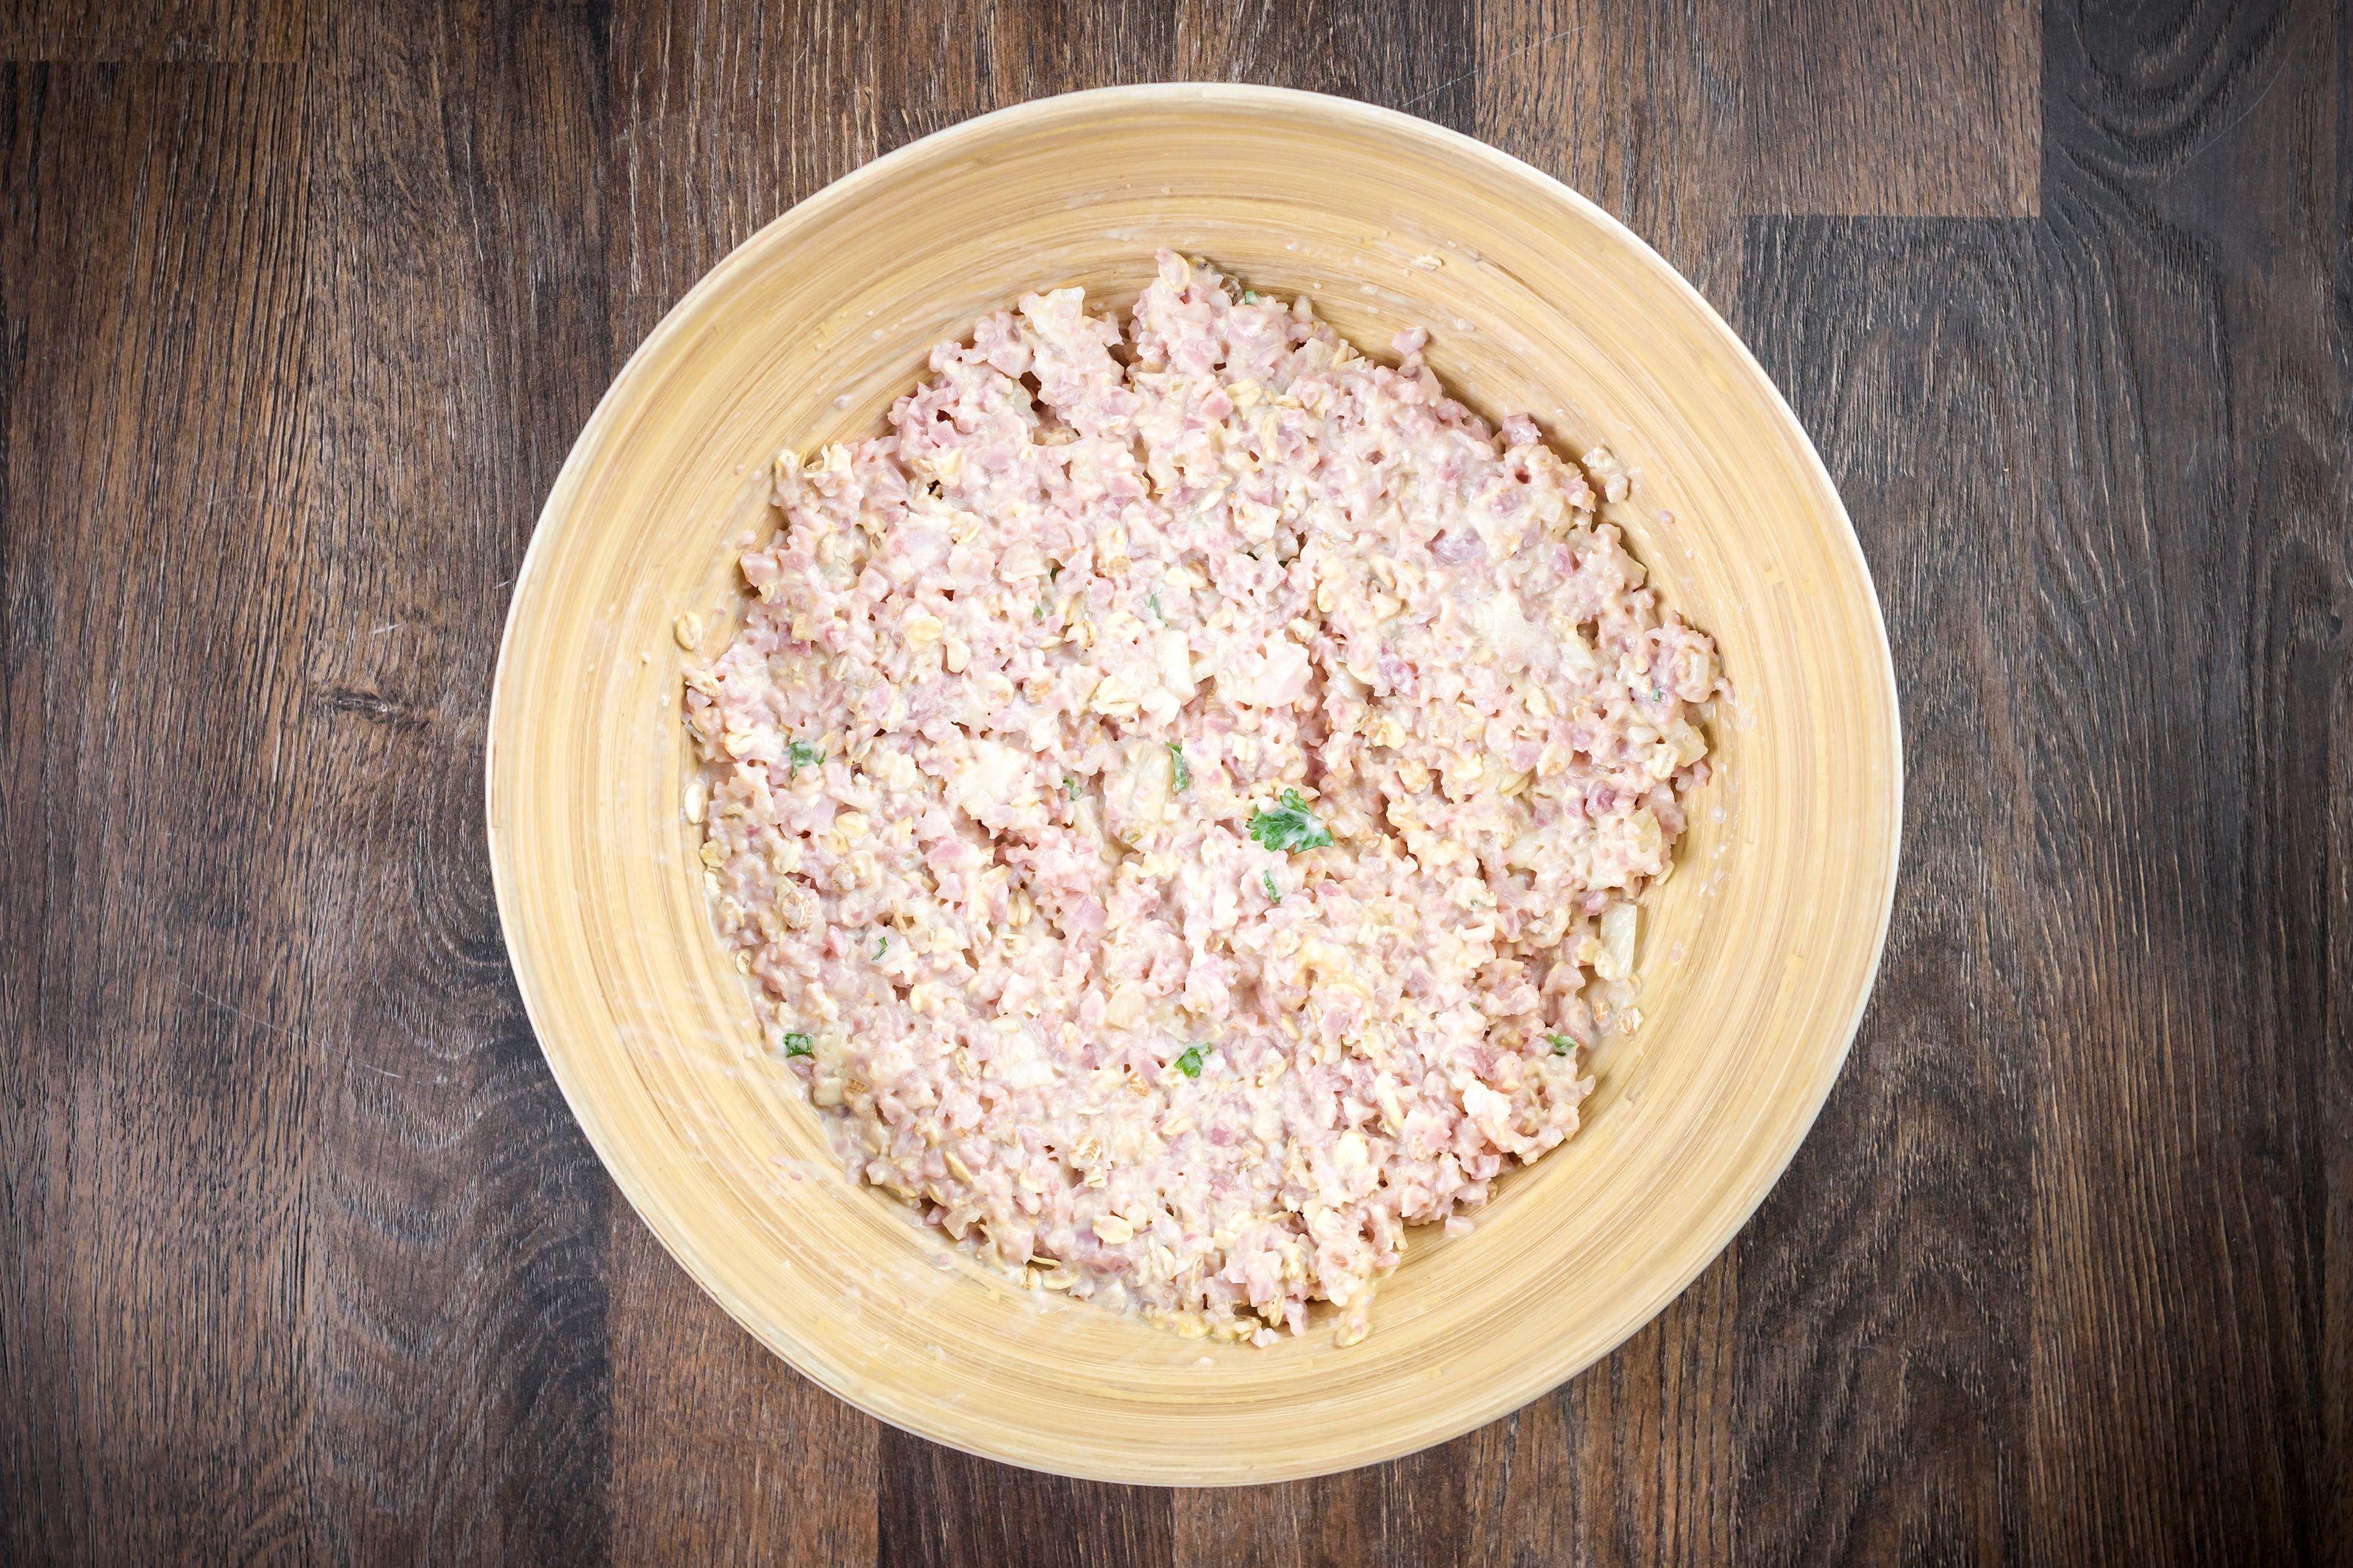 Combine ham, mustard in bowl